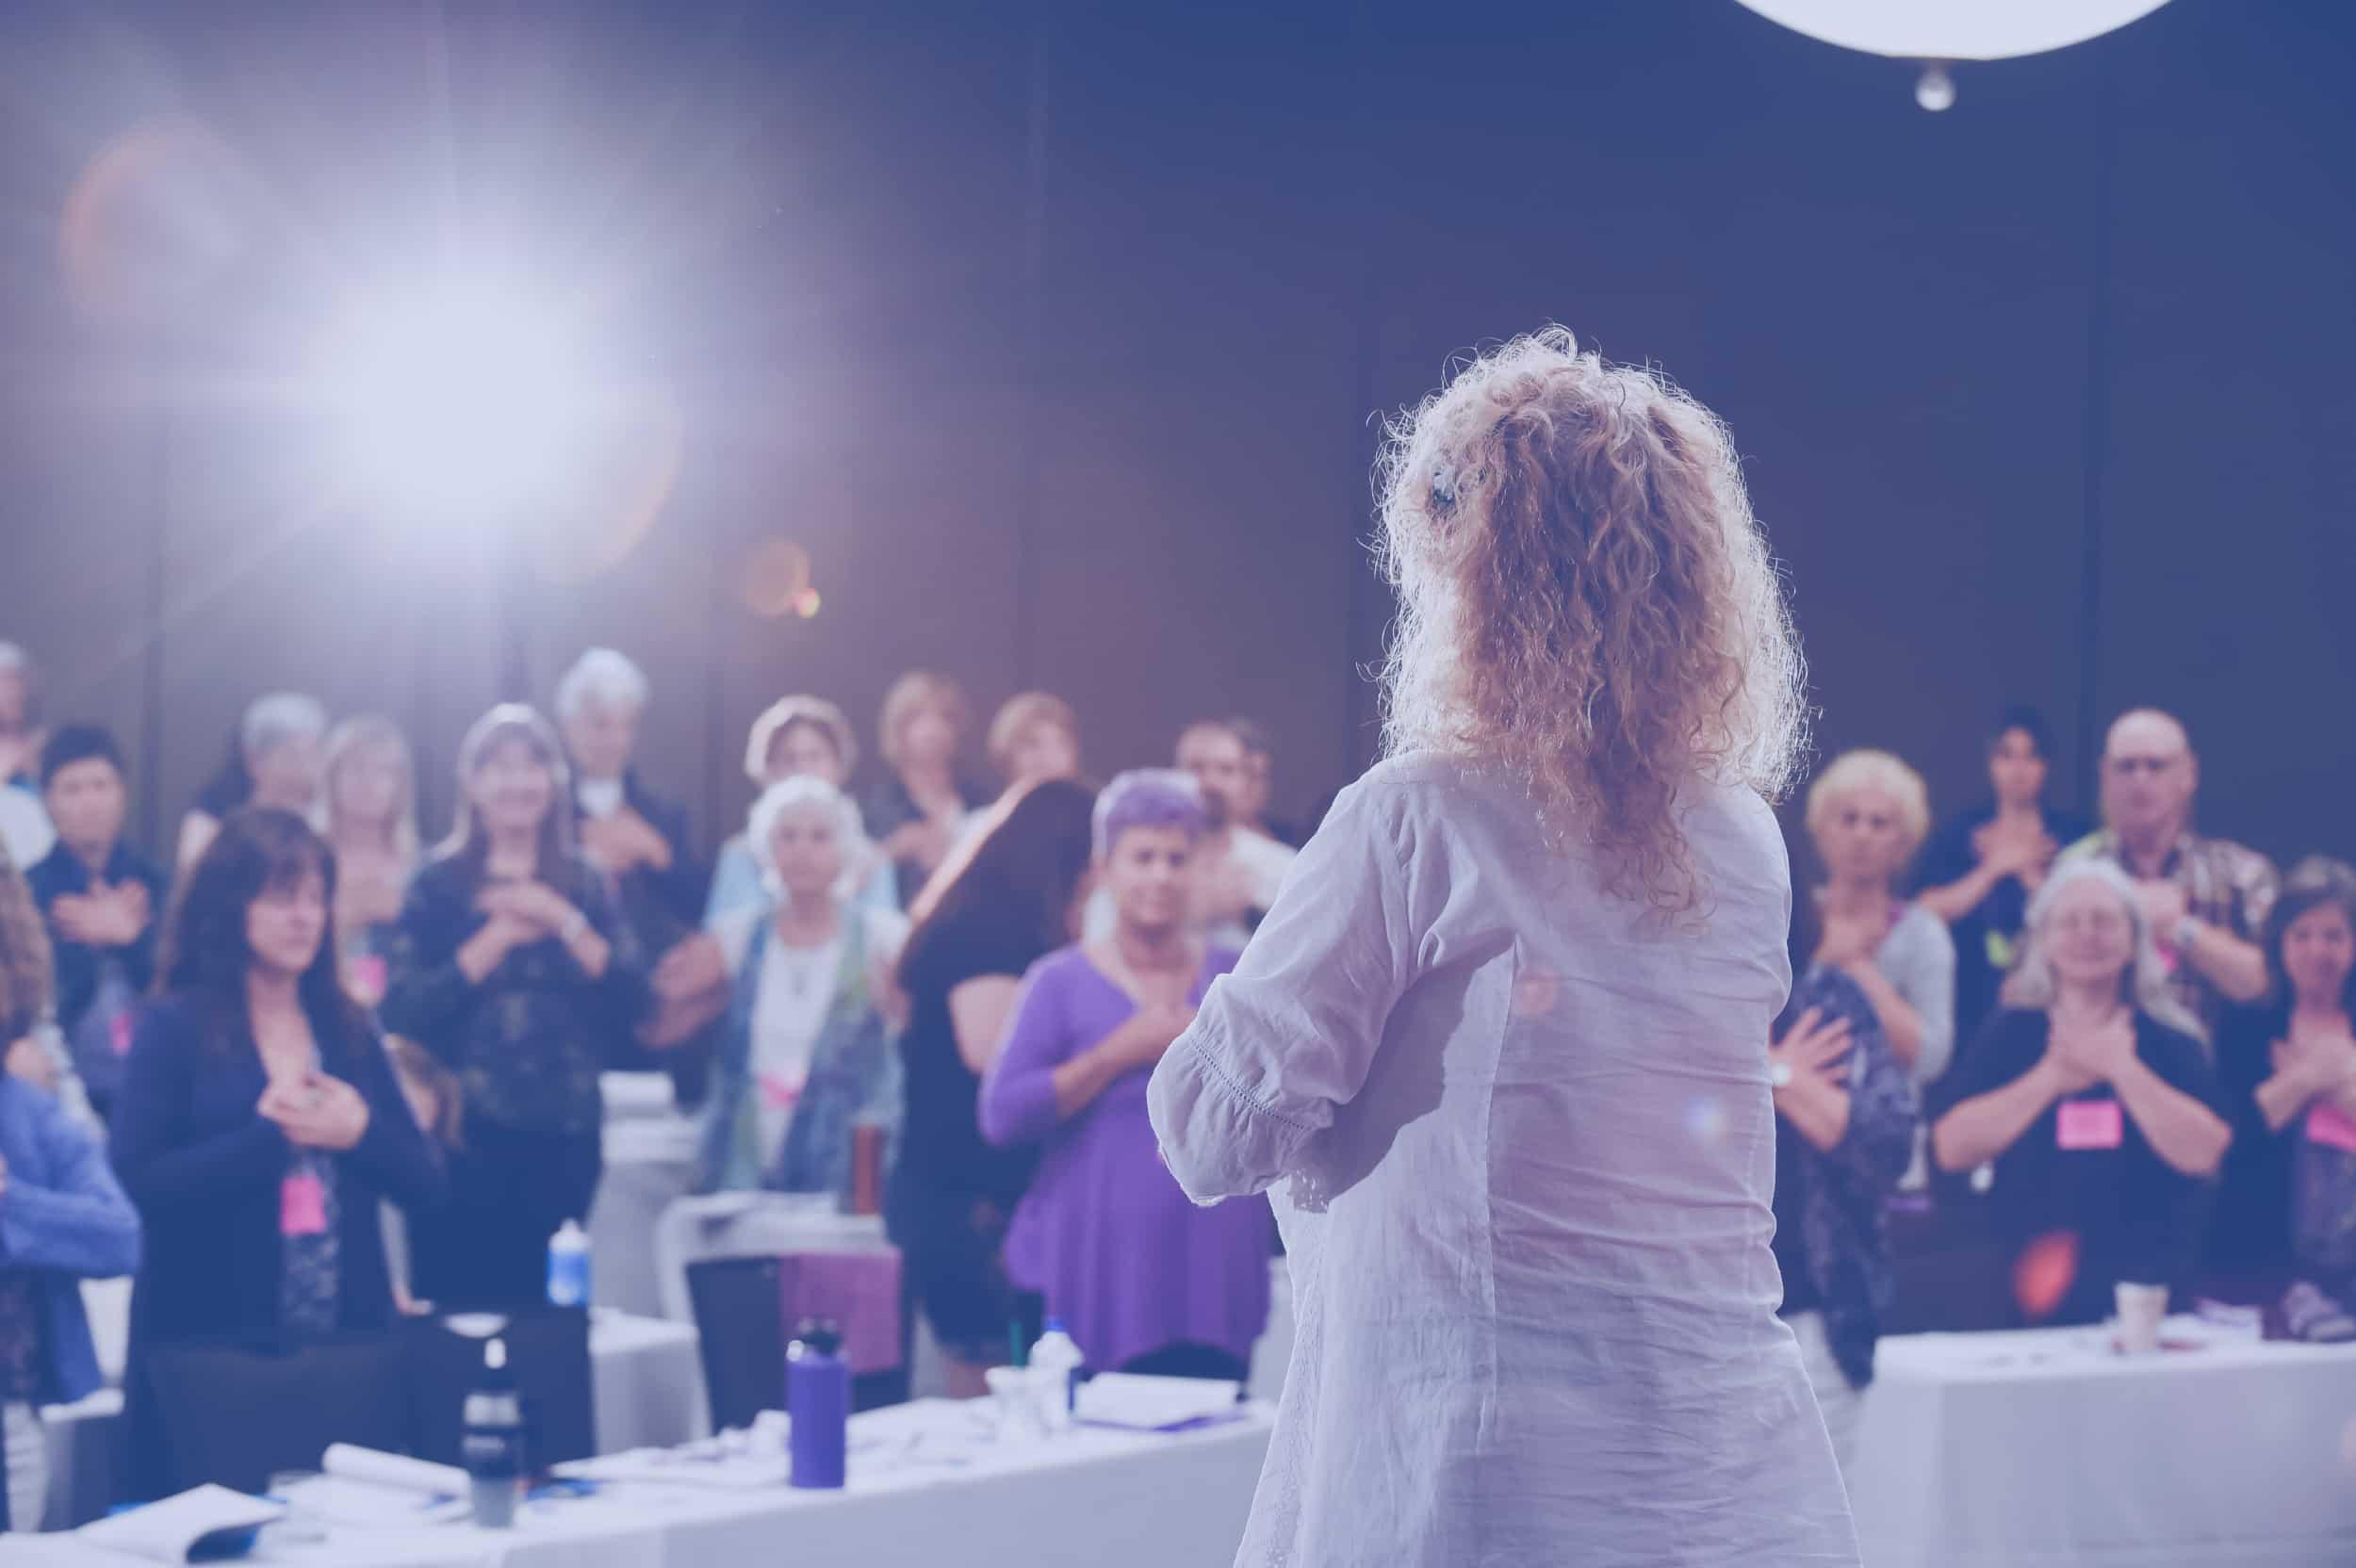 Eden Energy Medicine Hope Healing Amp Empowerment For